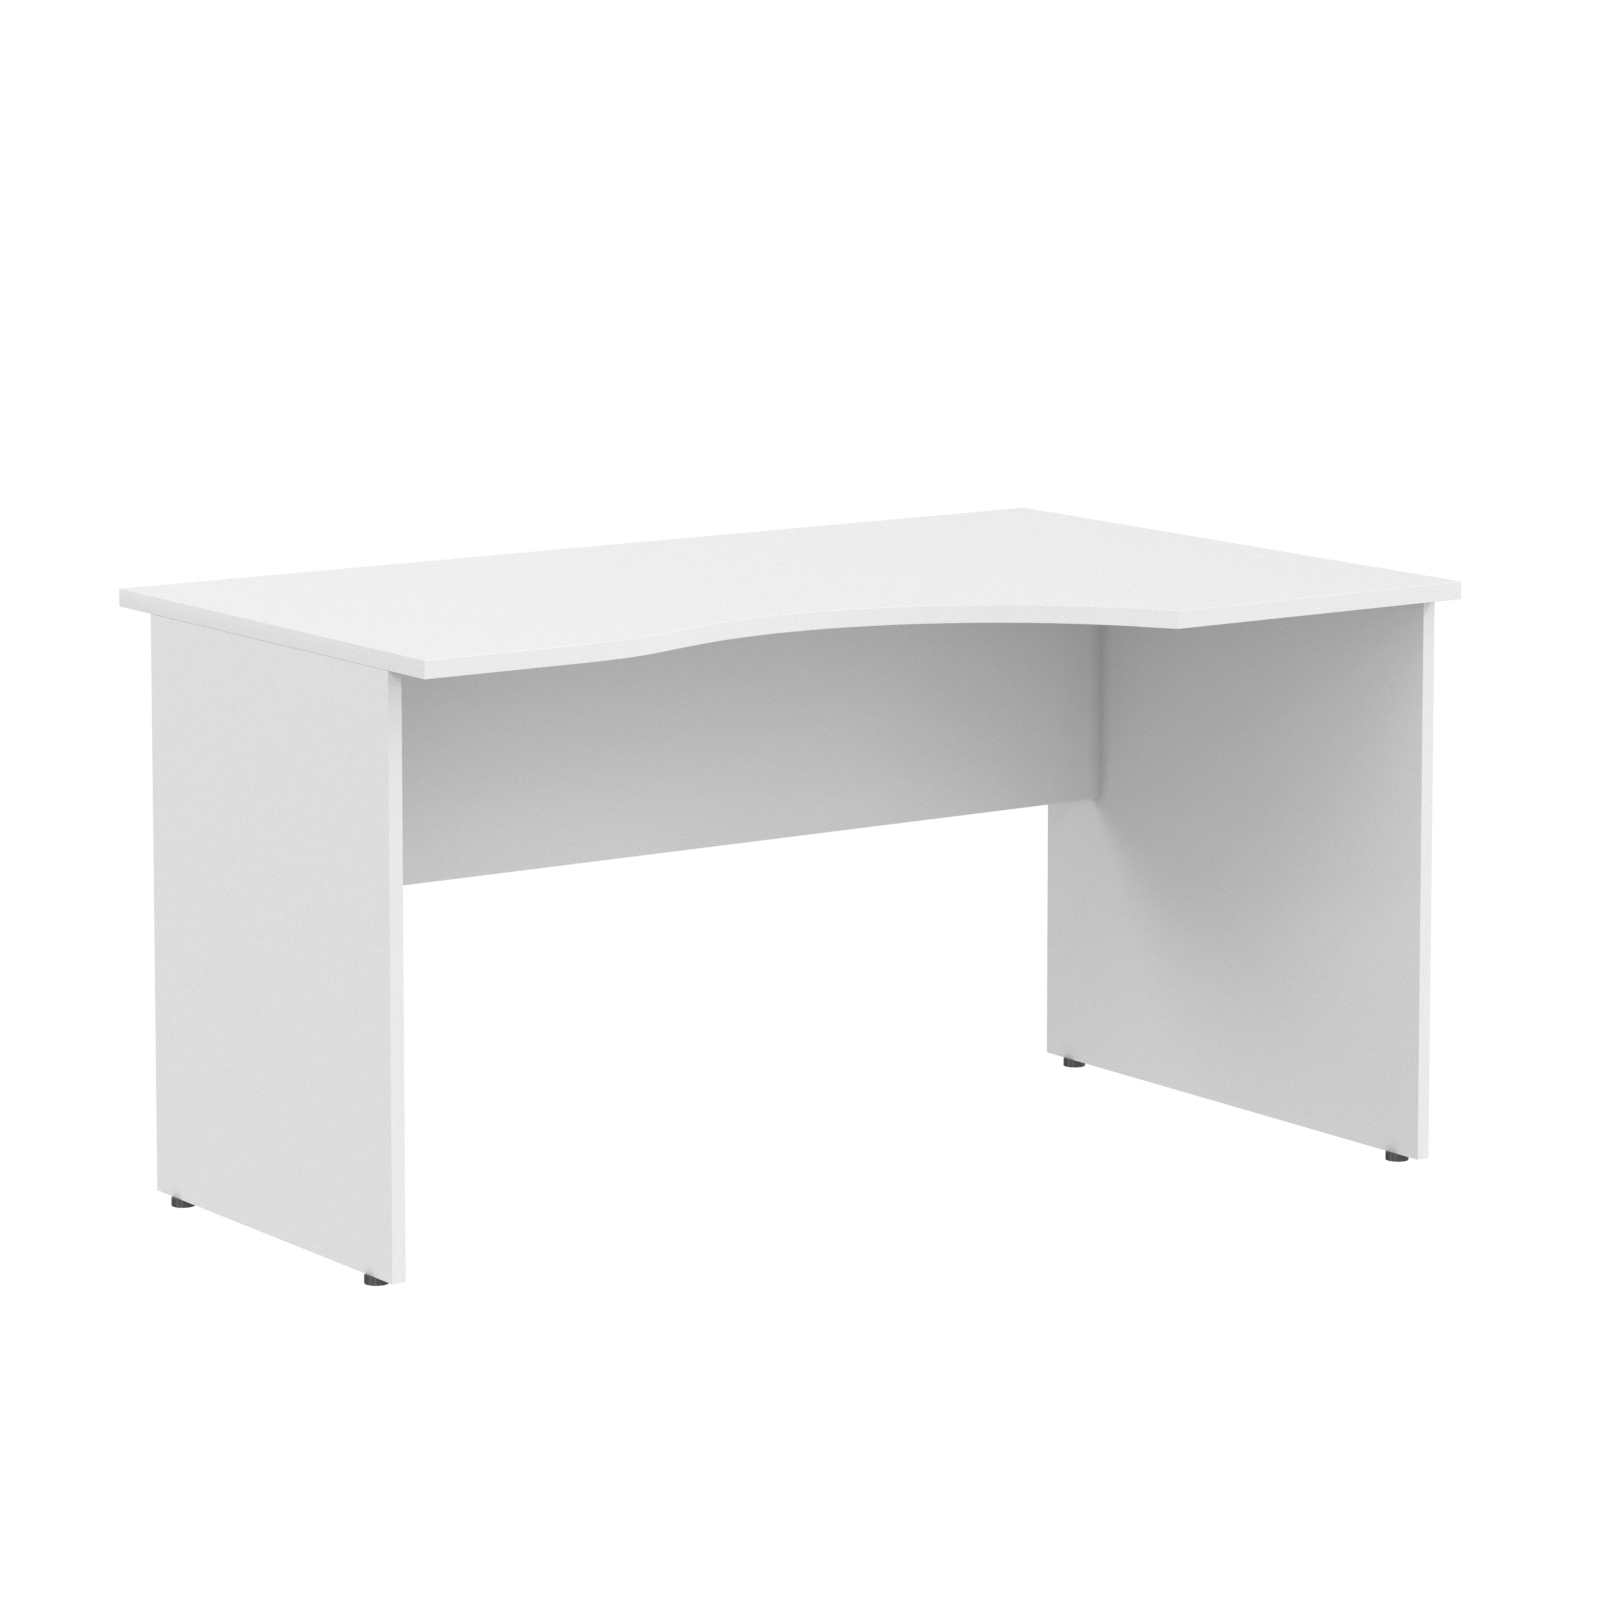 Компьютерный стол SKYLAND белый фото